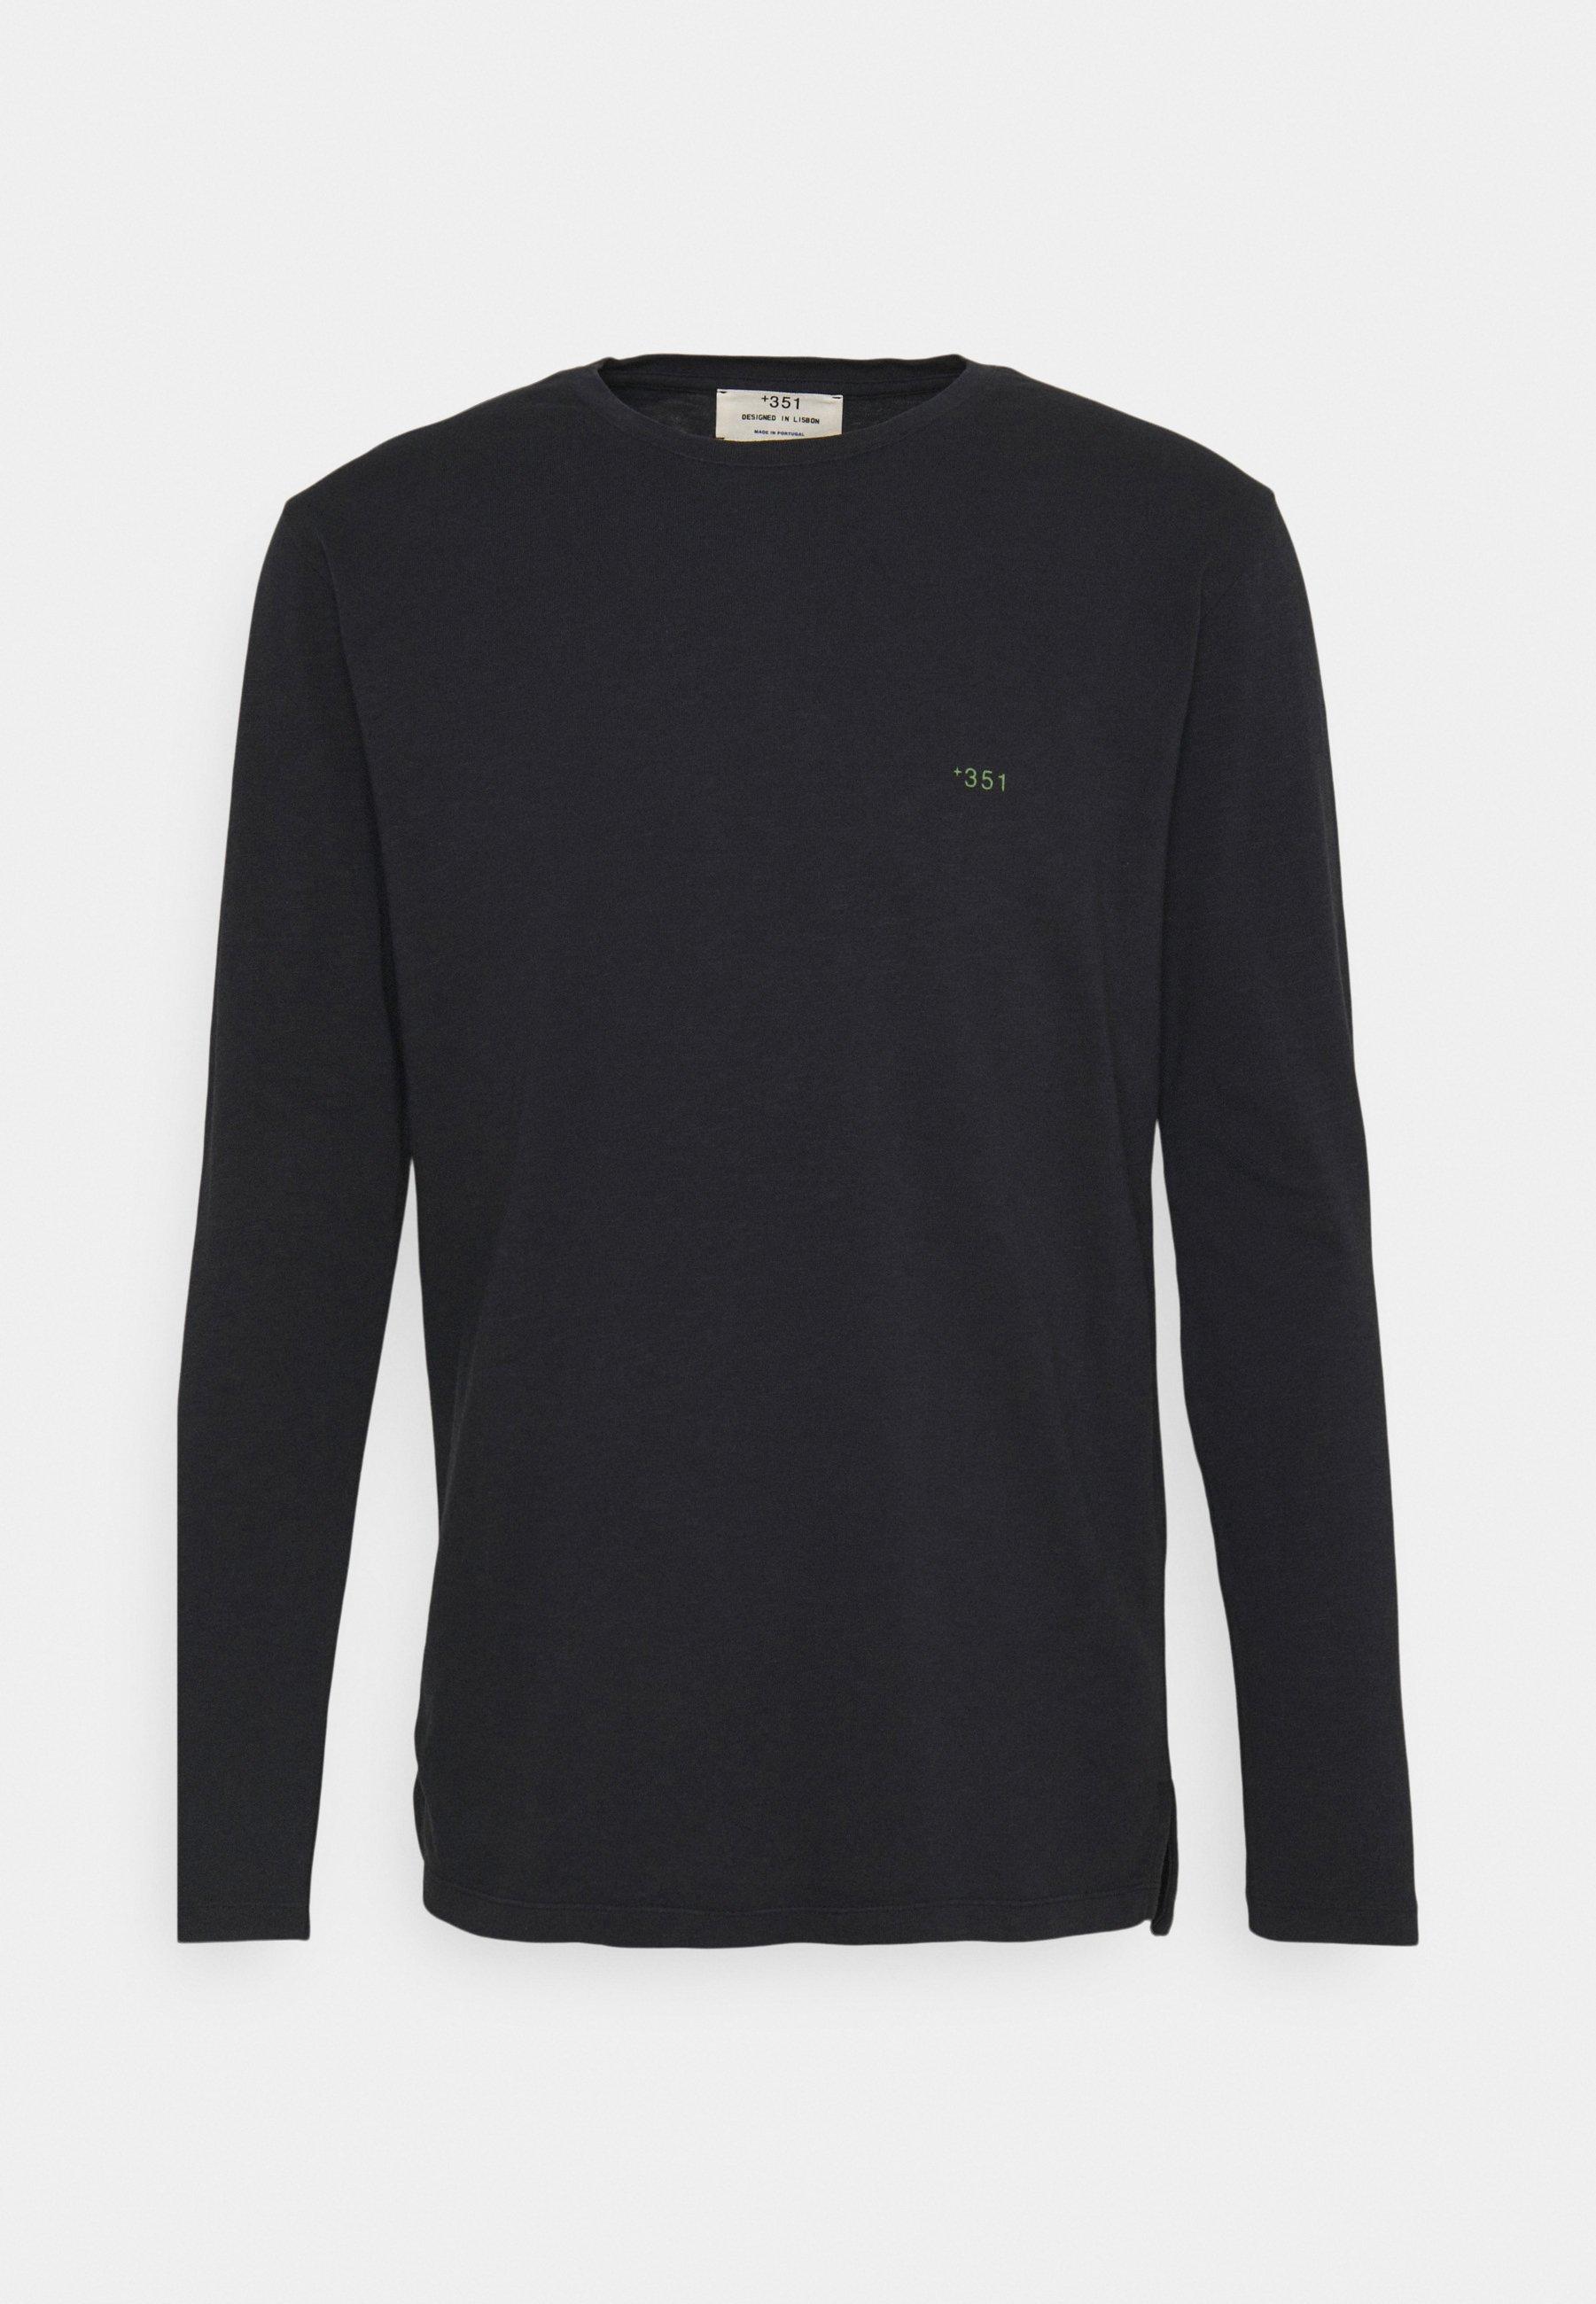 Uomo GRAFFIC NOW LONG SLEEVE UNISEX - Maglietta a manica lunga